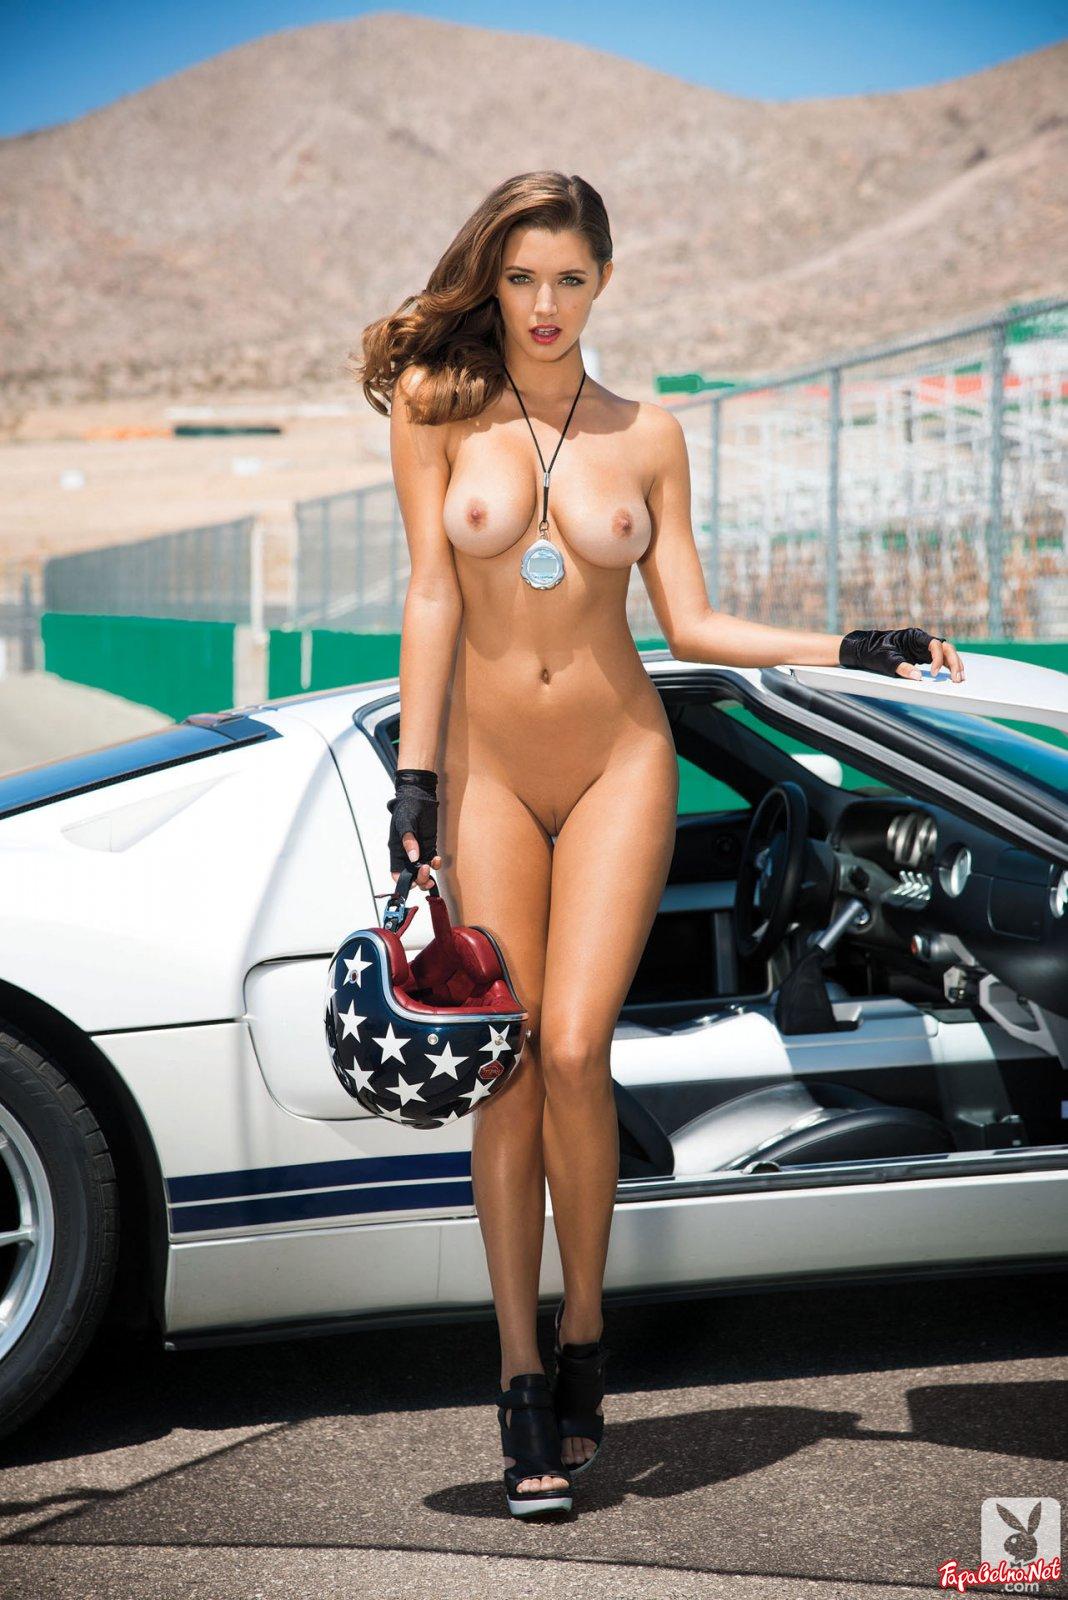 Alyssa arce, tiffany toth, and jaclyn swedberg nude naked hot for fucking playboy